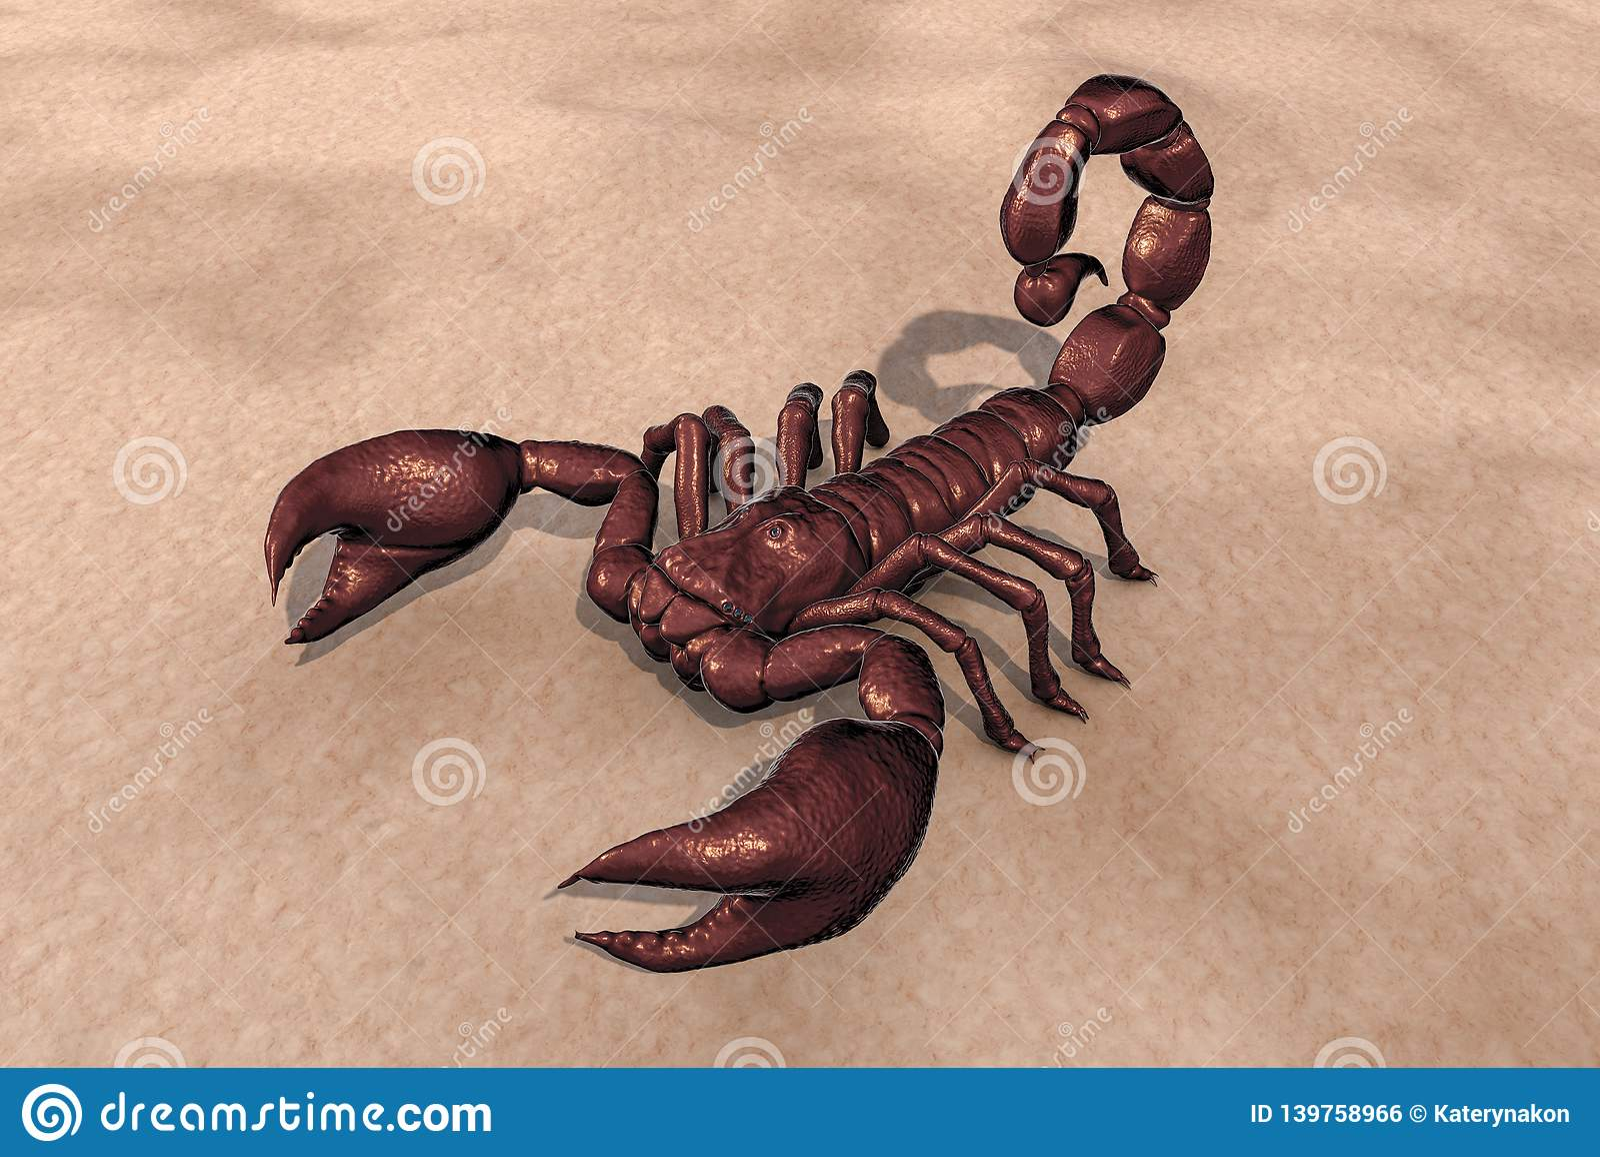 Scorpion, realistic illustration royalty free stock image